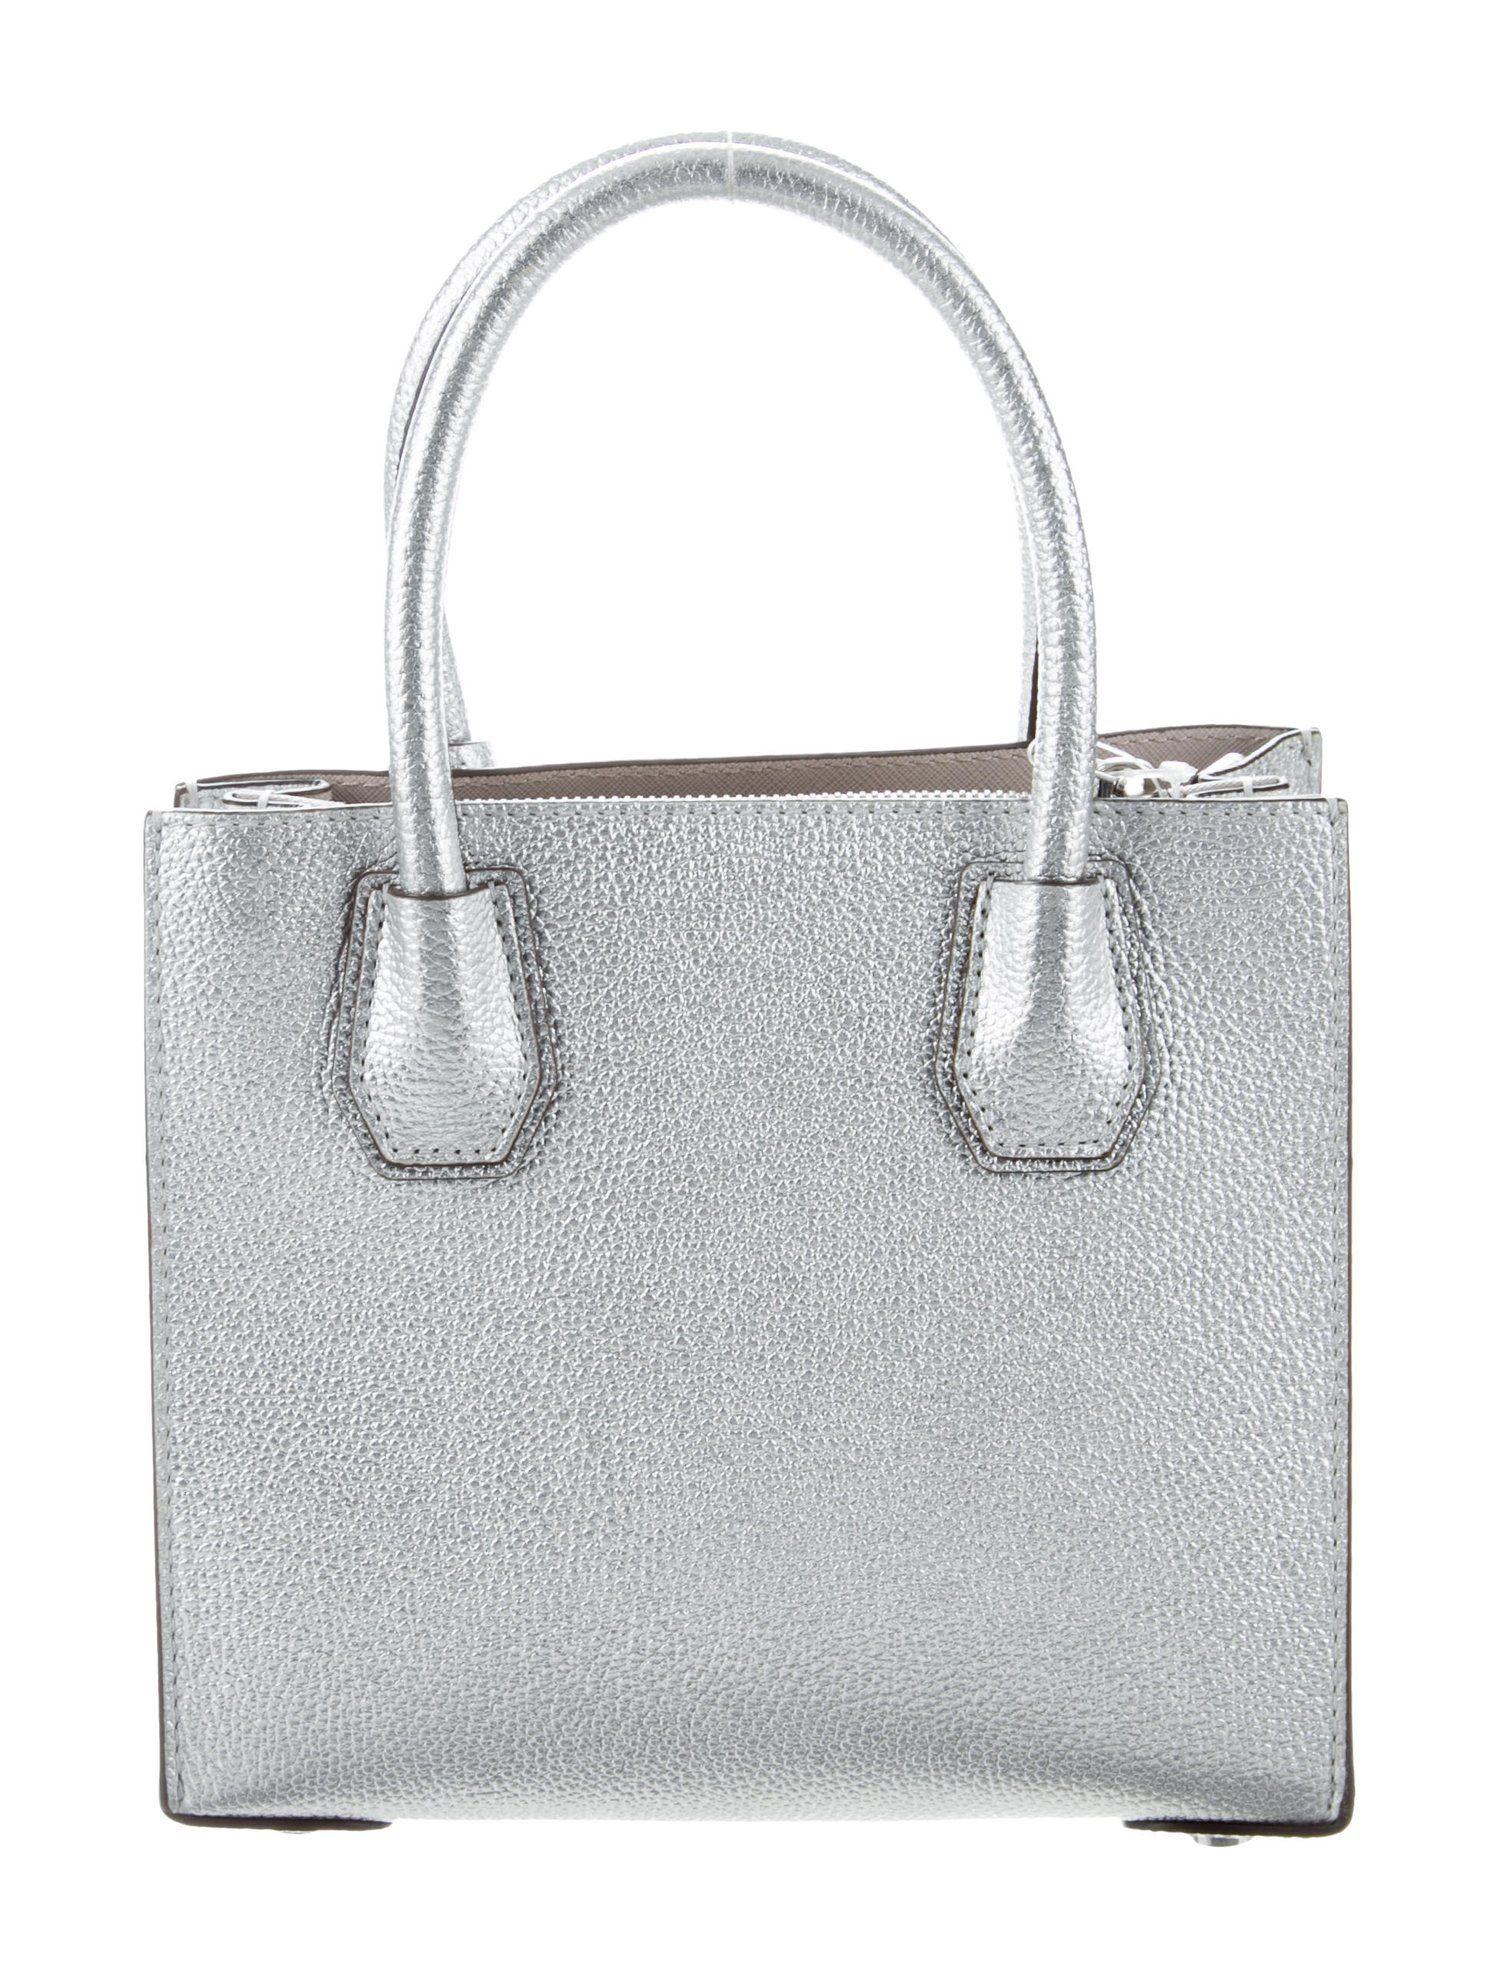 Mercer Metallic Shoulder Bag | Trendy outfits in 2019